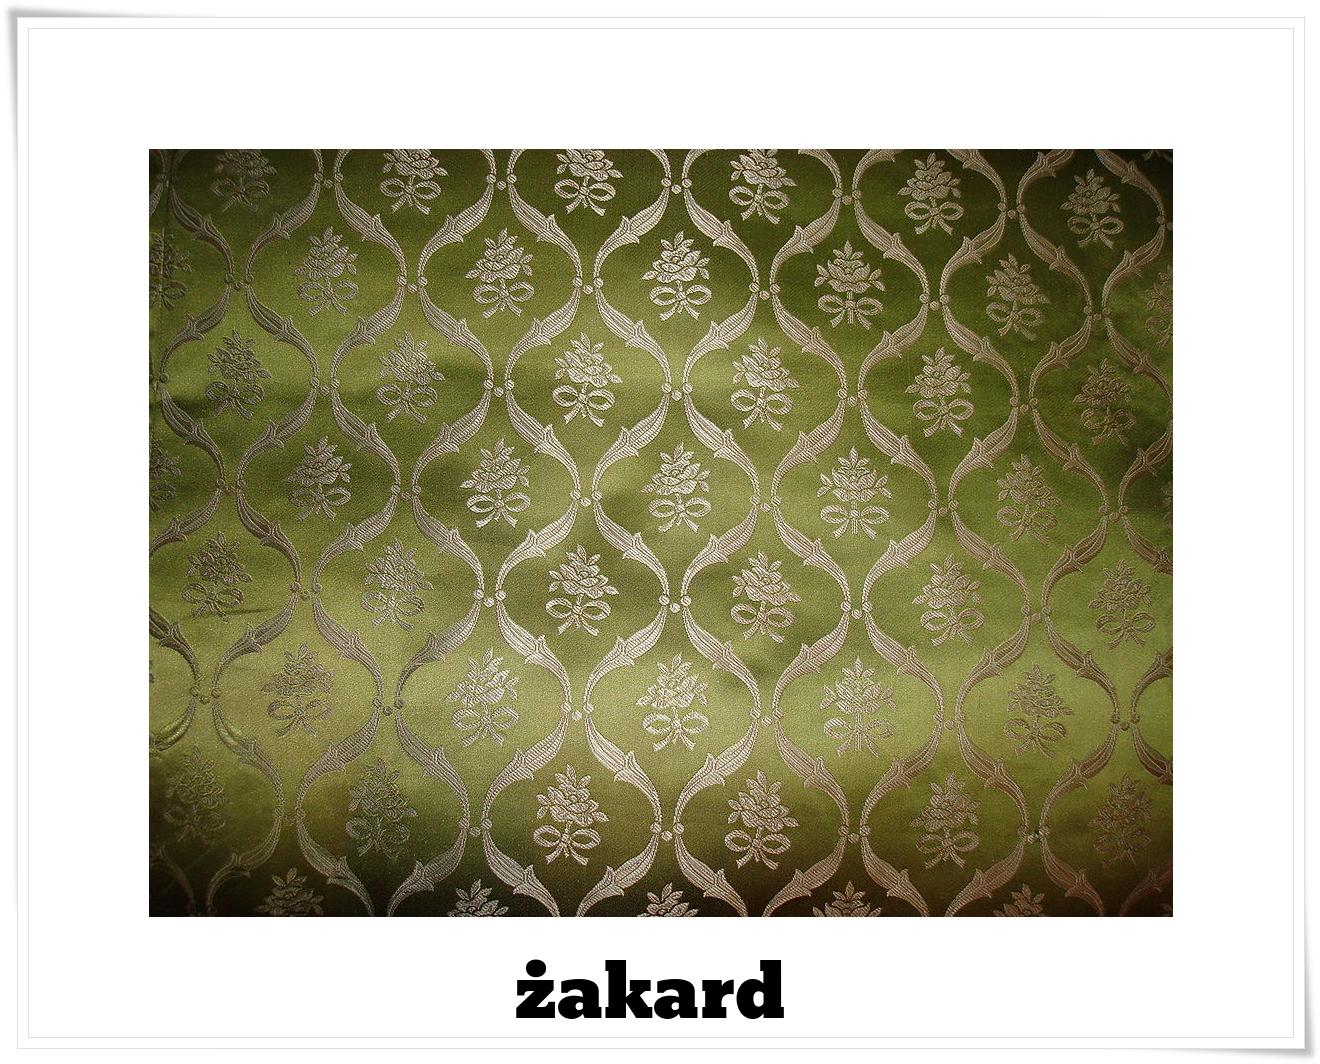 żakard - Szwedzka tapicerka jedwabna fot Kerstin Wölling